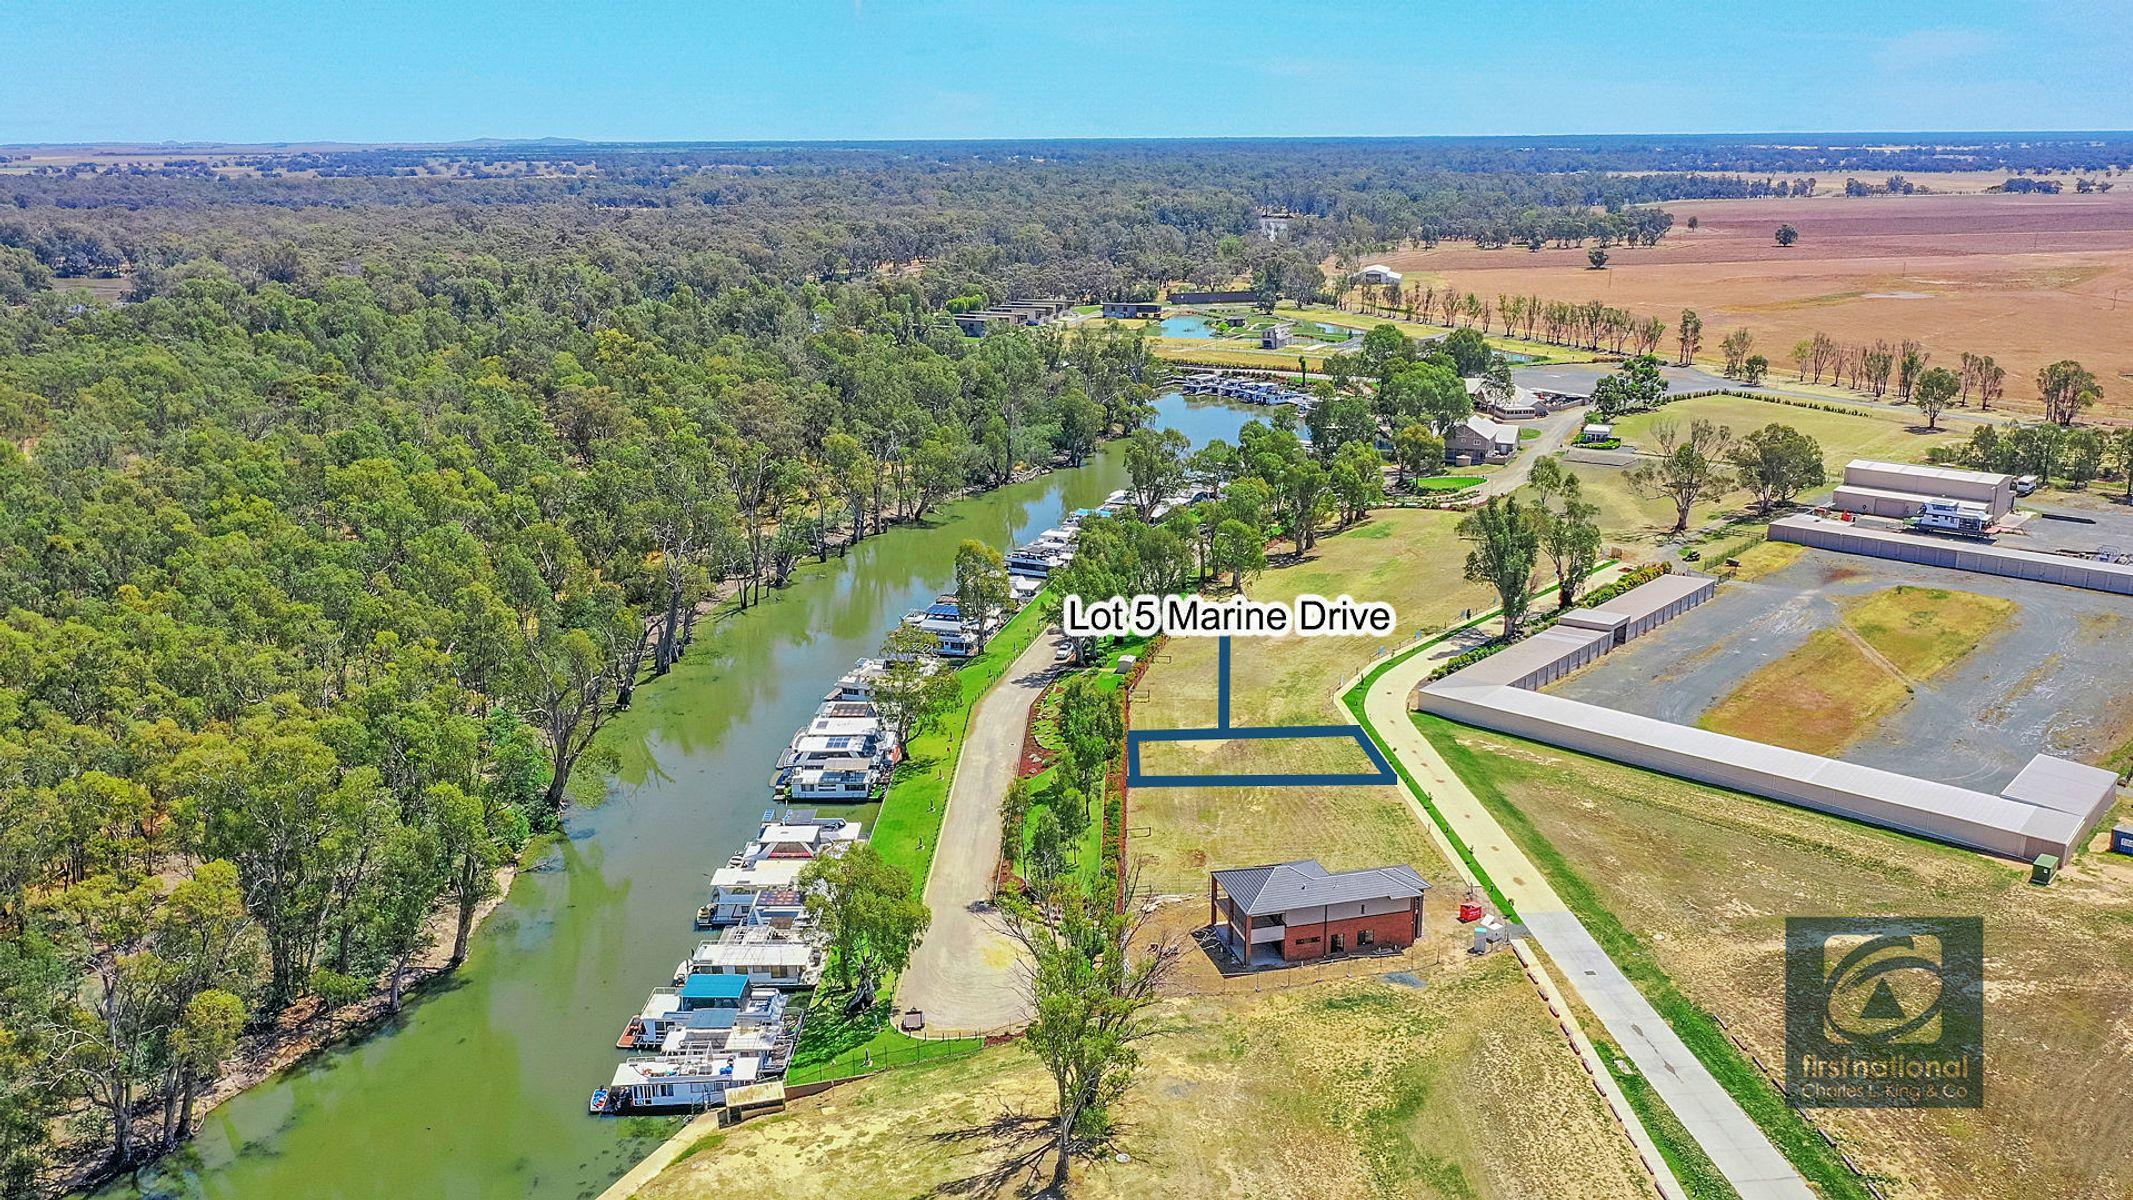 Lot 85 Marine Drive, Moama, NSW 2731